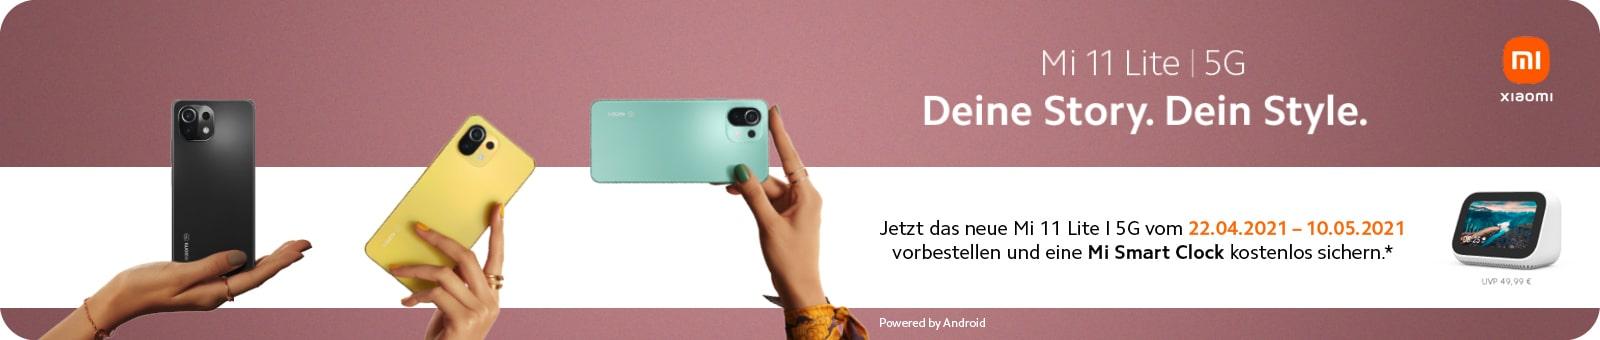 Xiaomi Mi 11 Lite 5G pre-order